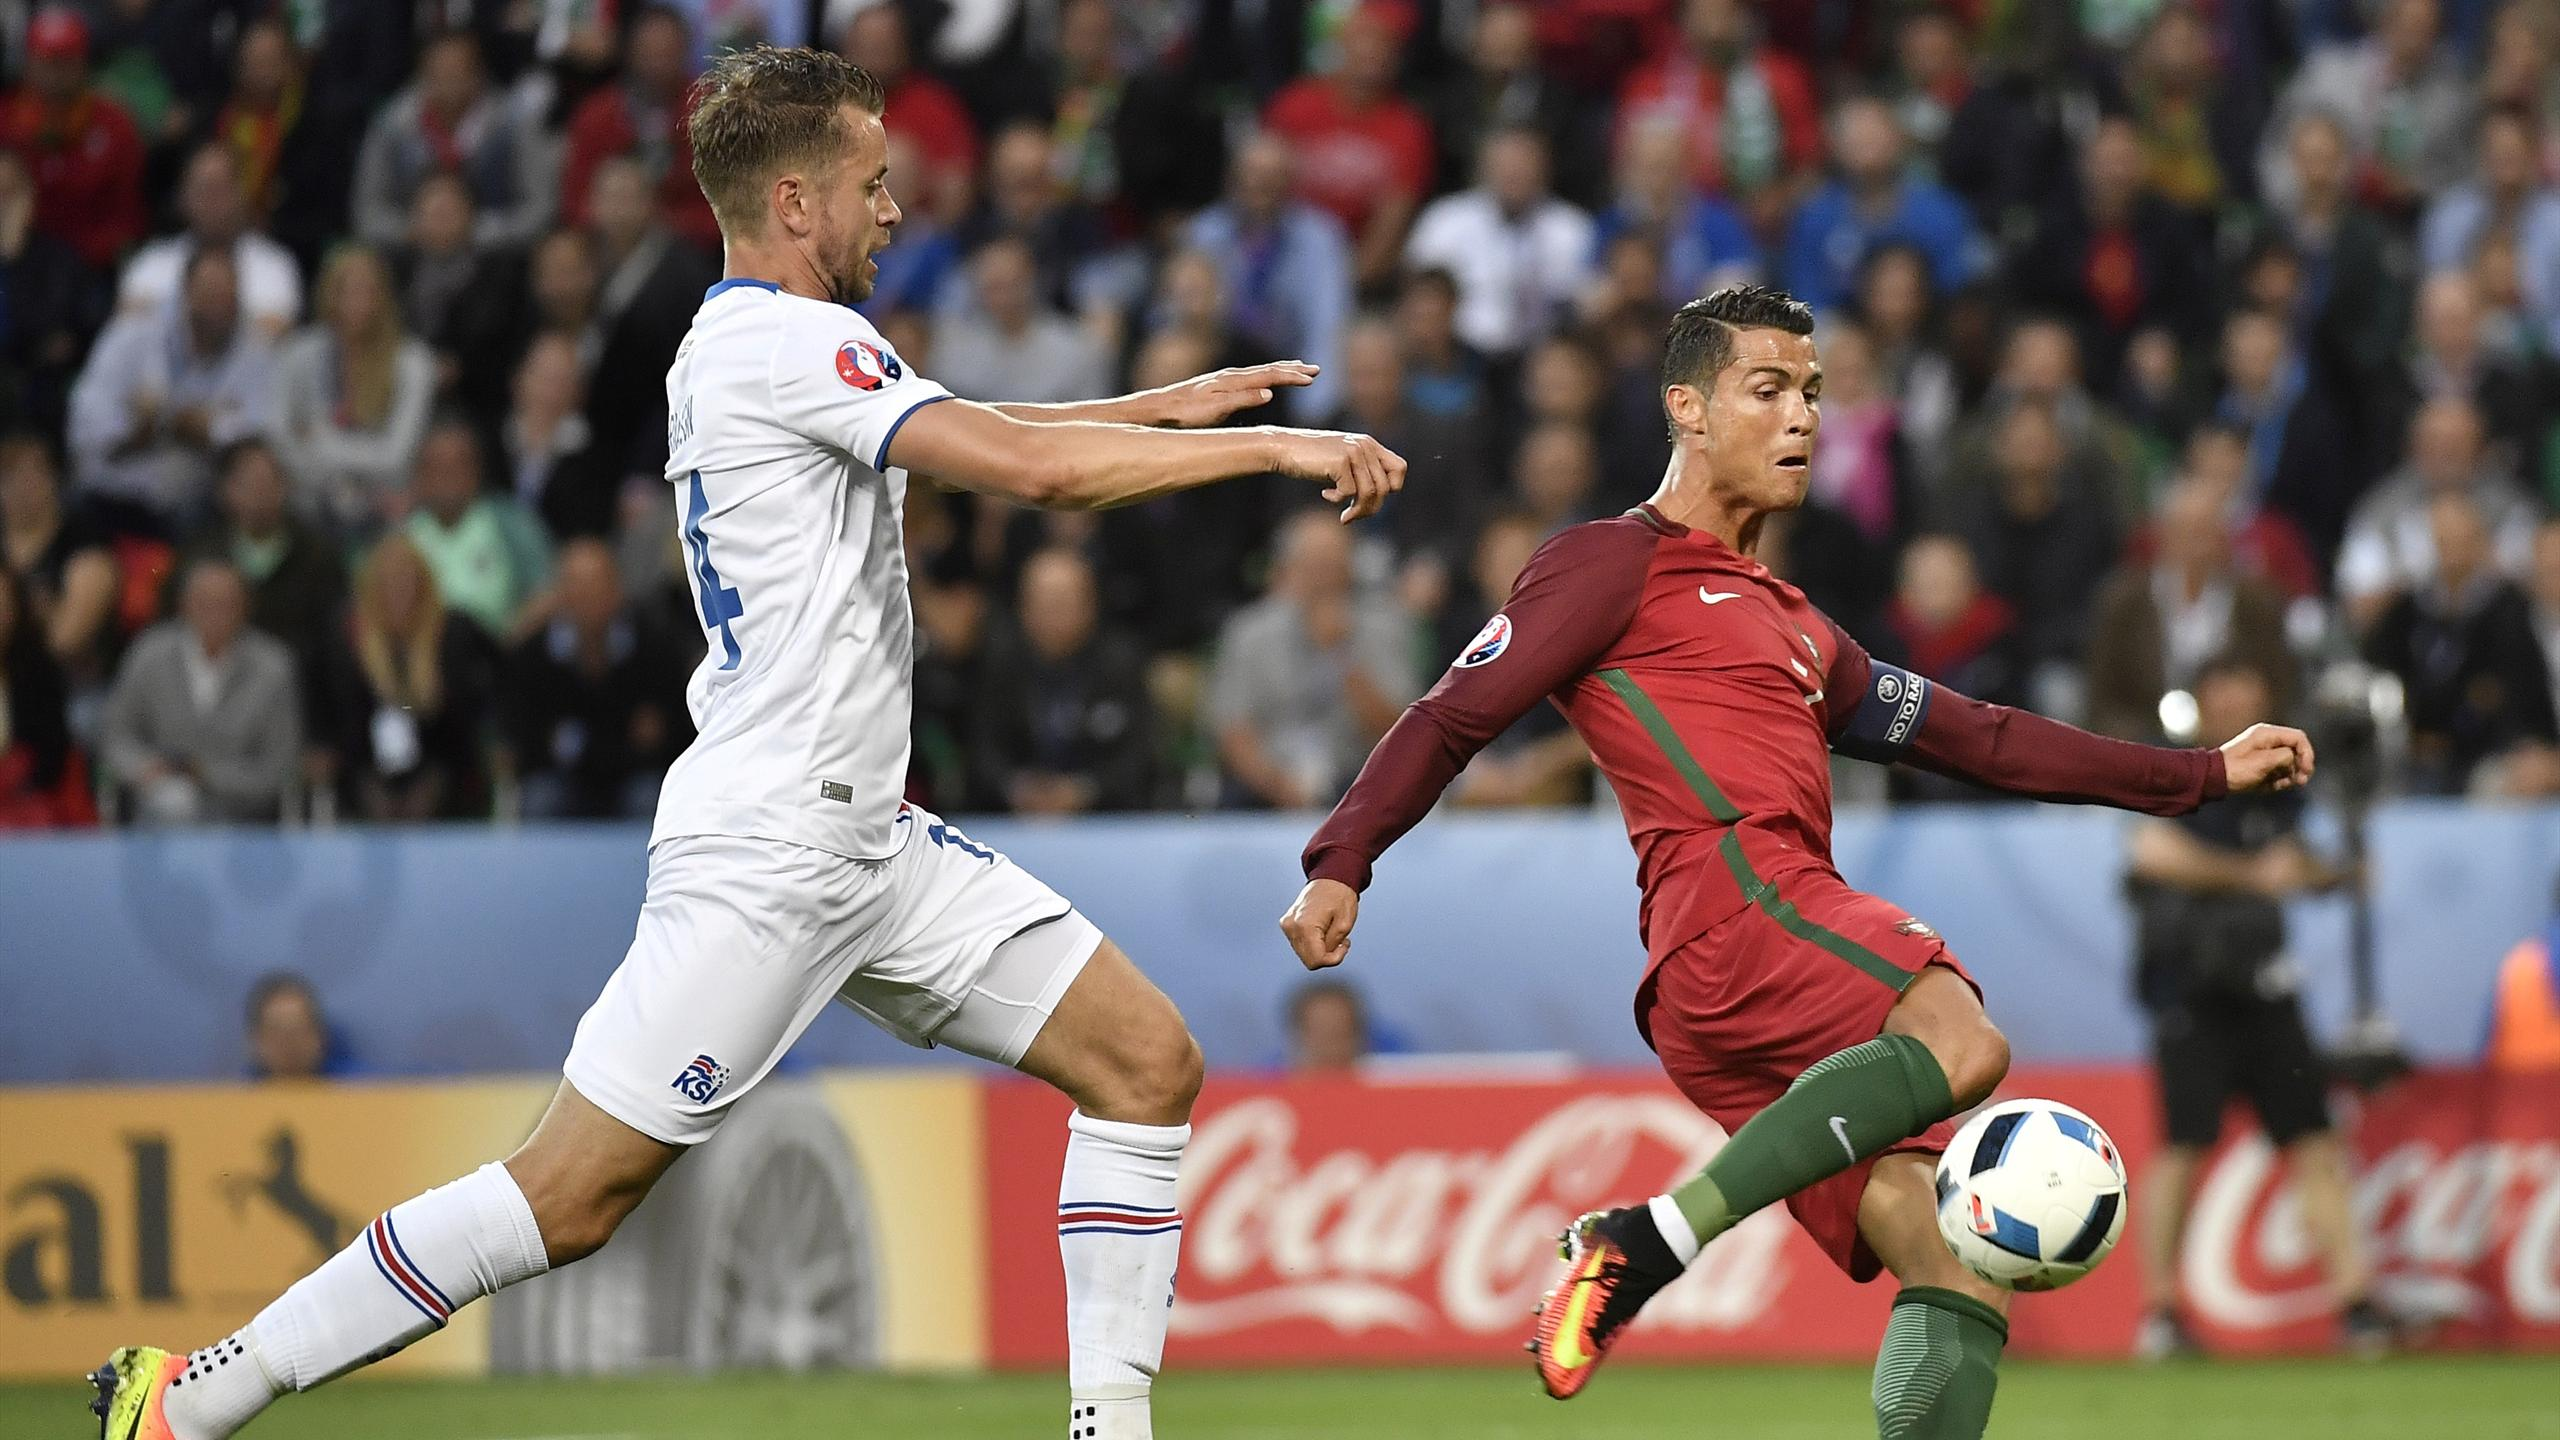 Cristiano Ronaldo (Portugal) face à l'Islande - Euro 2016